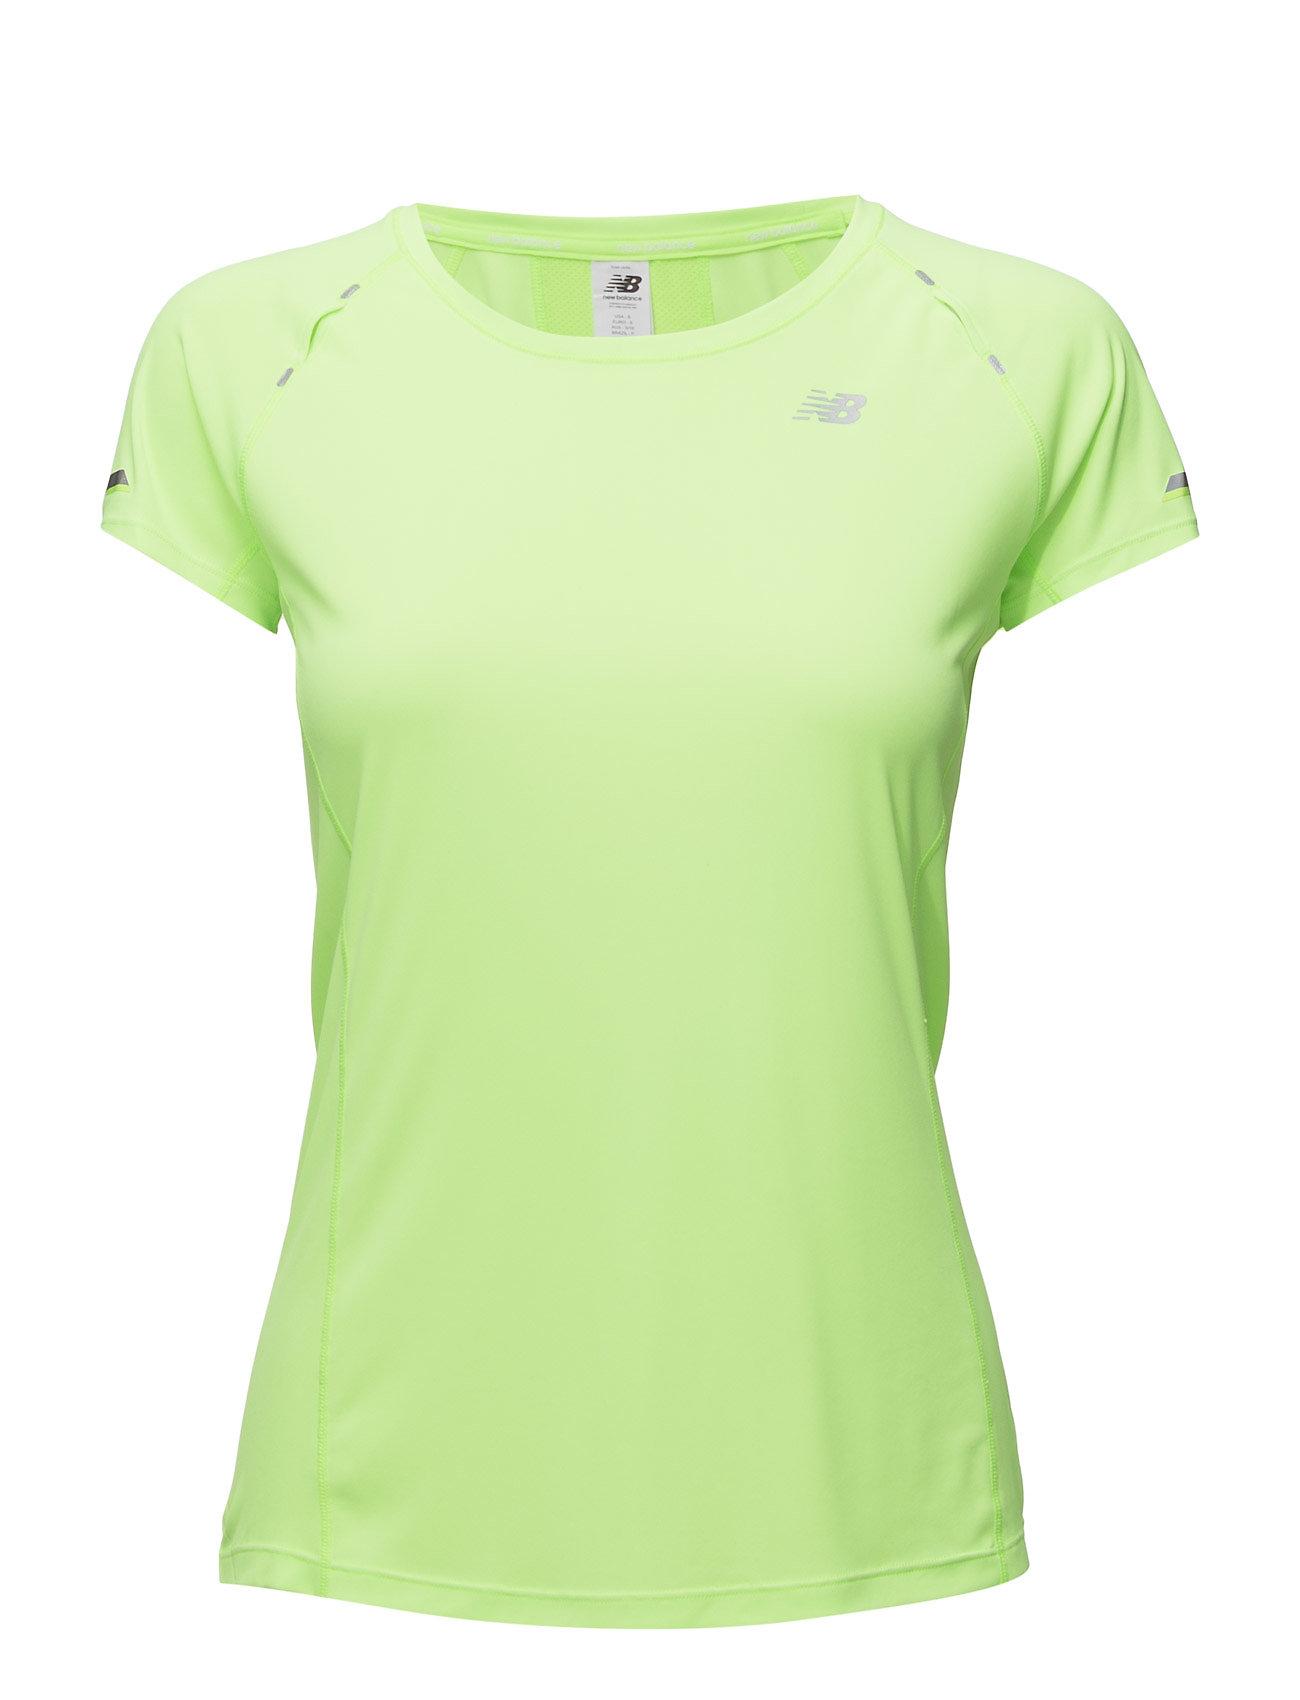 Nb Ice Short Sleeve New Balance Løbe t-shirts til Damer i